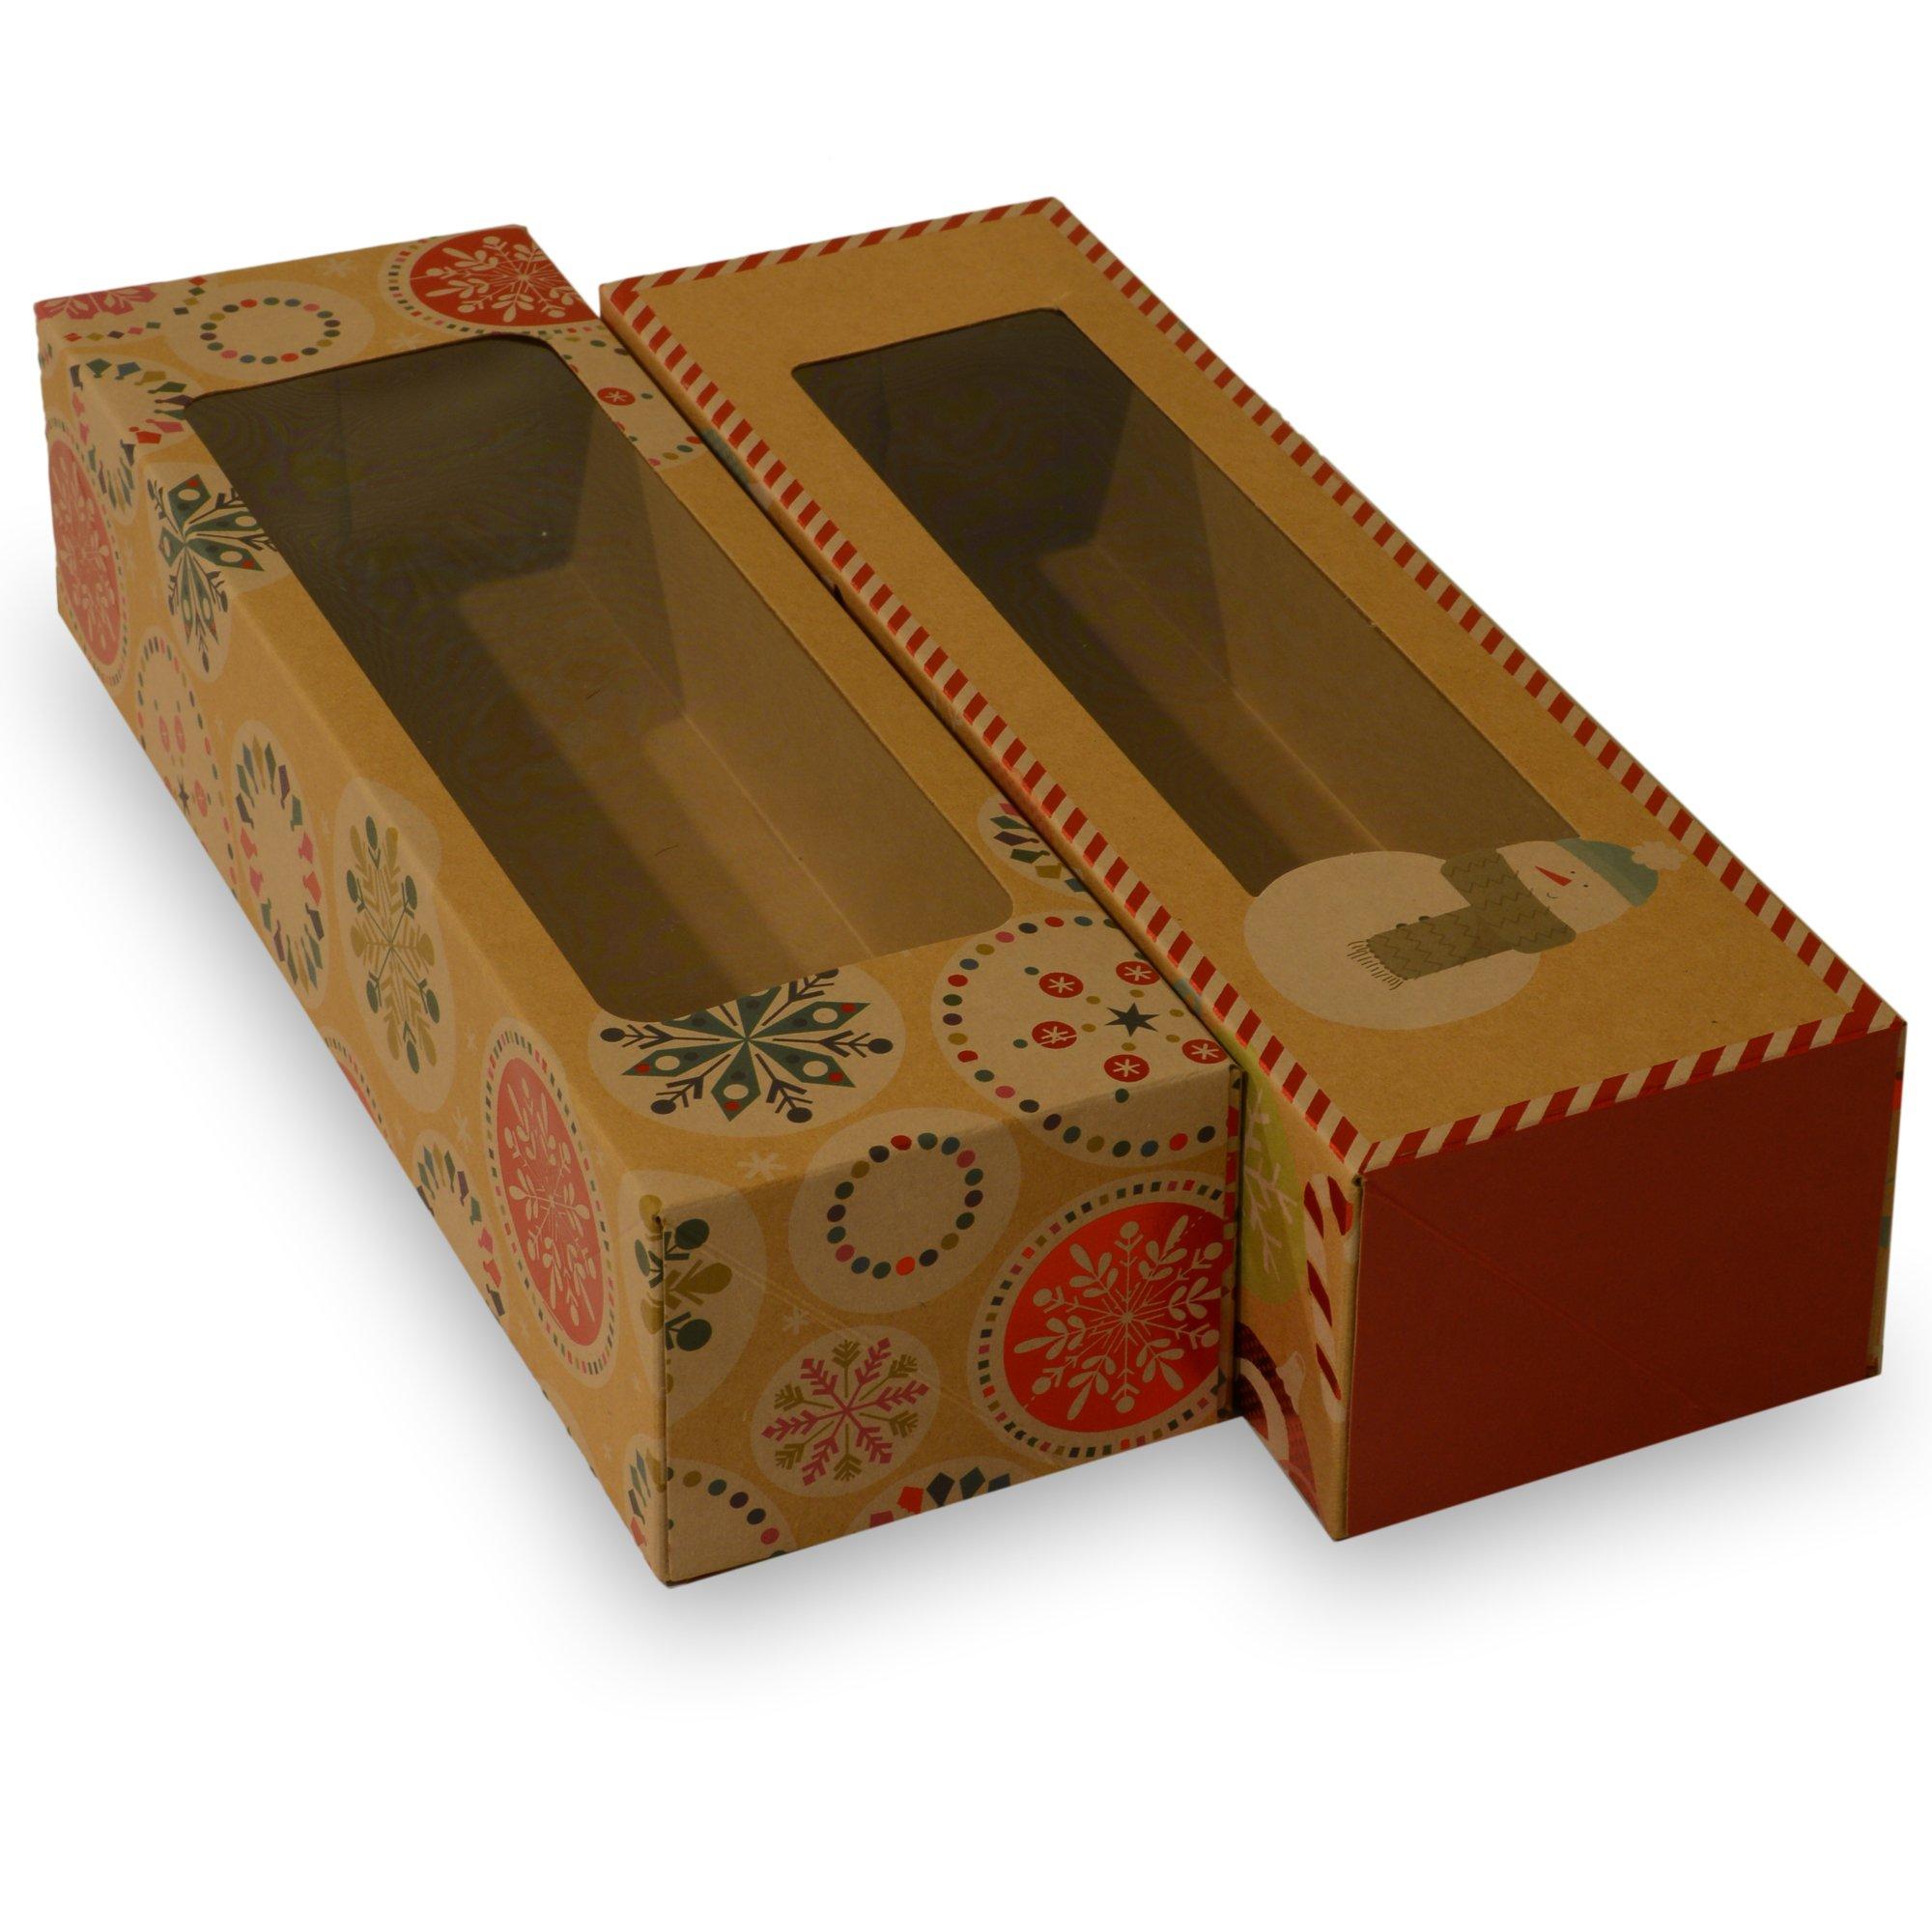 16 X 12 Custom Printed Kraft Paper Wedding Gift Bags: Amazon.com: Christmas Cookie Box, Bakery Set; Brown Kraft